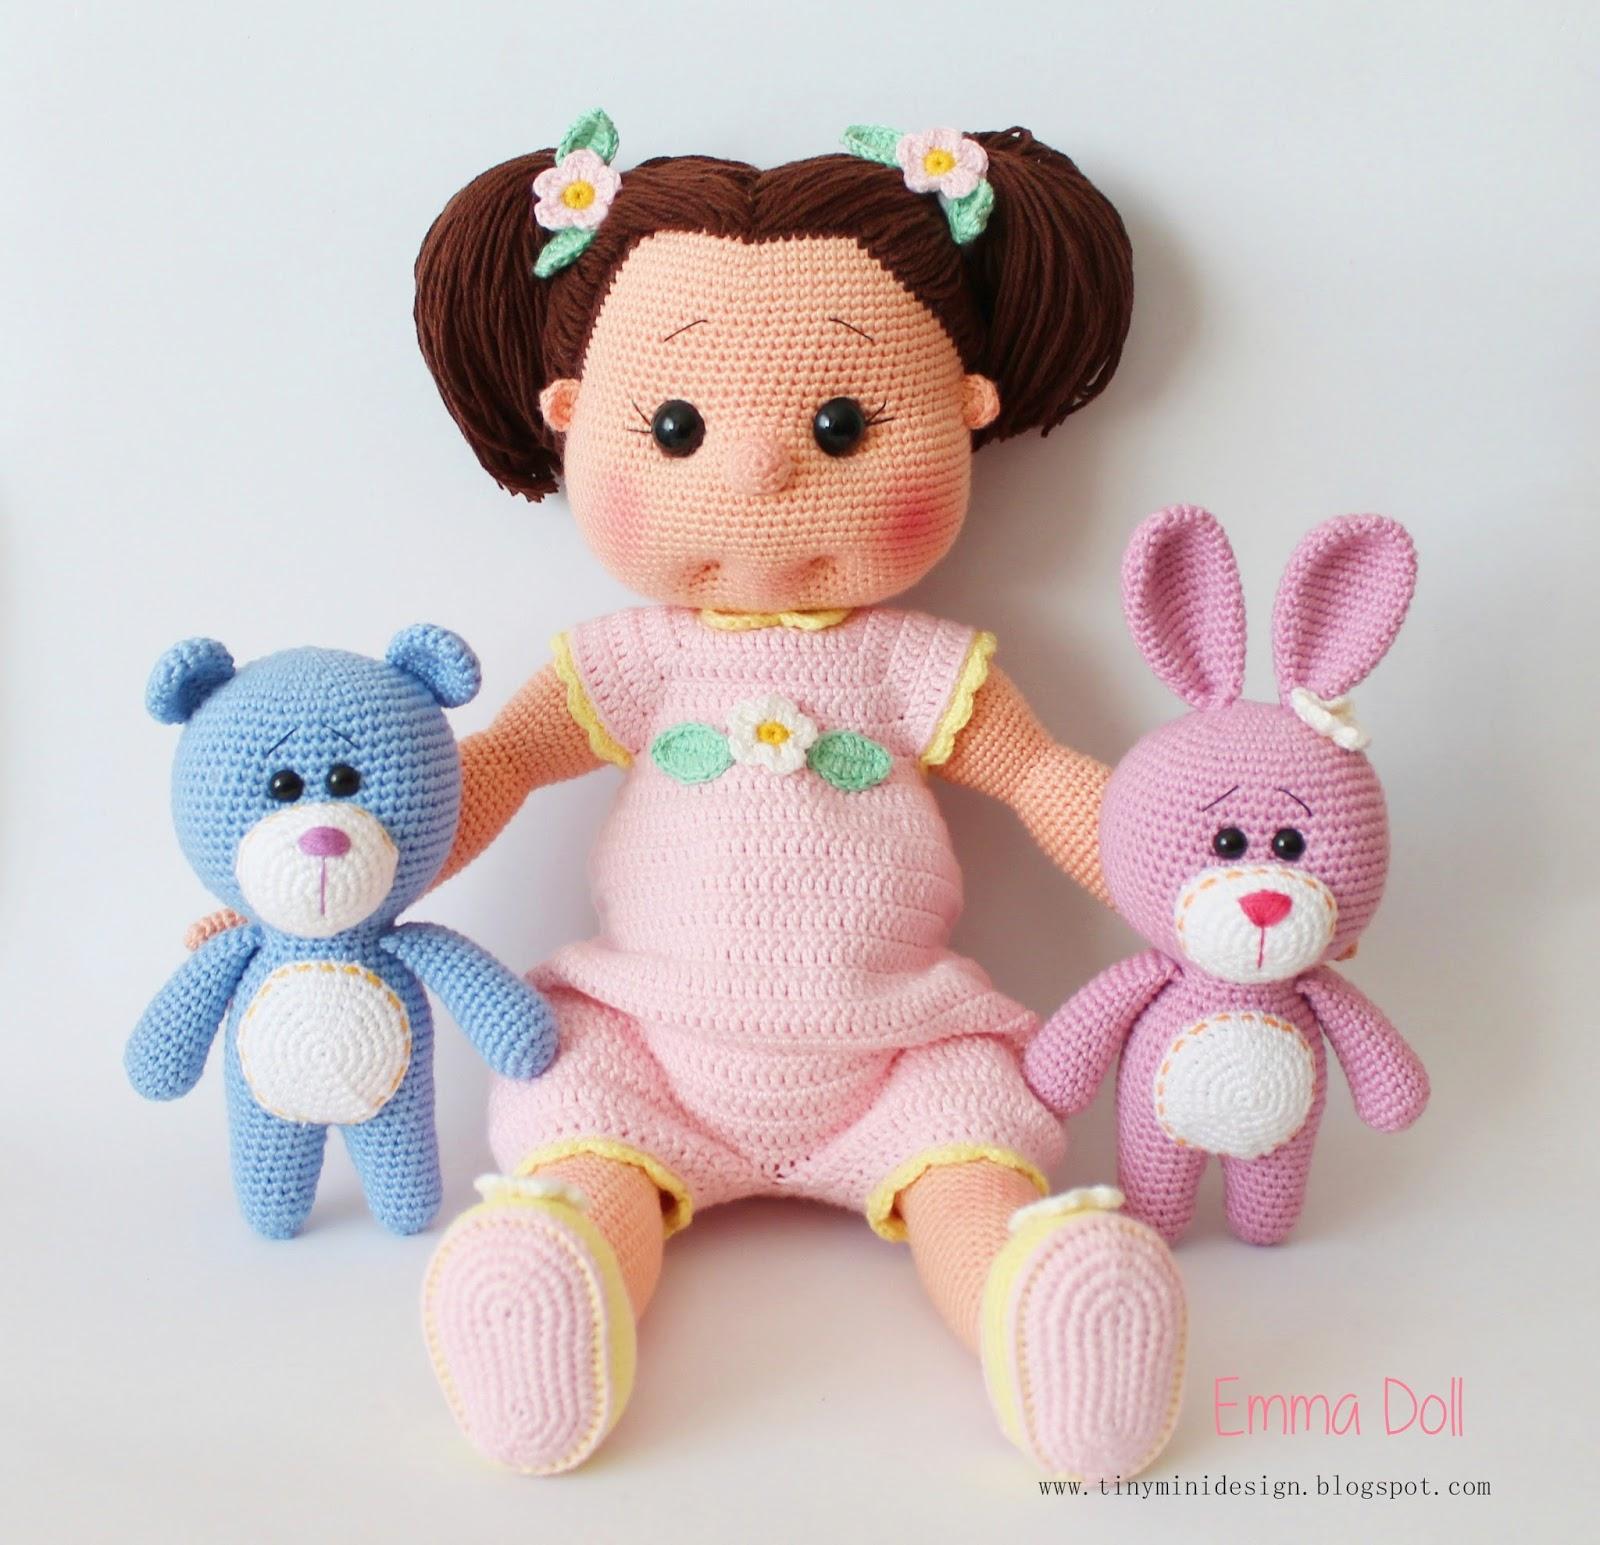 Amigurumi Bebek Tarifi : Amigurumi emma doll tiny mini design